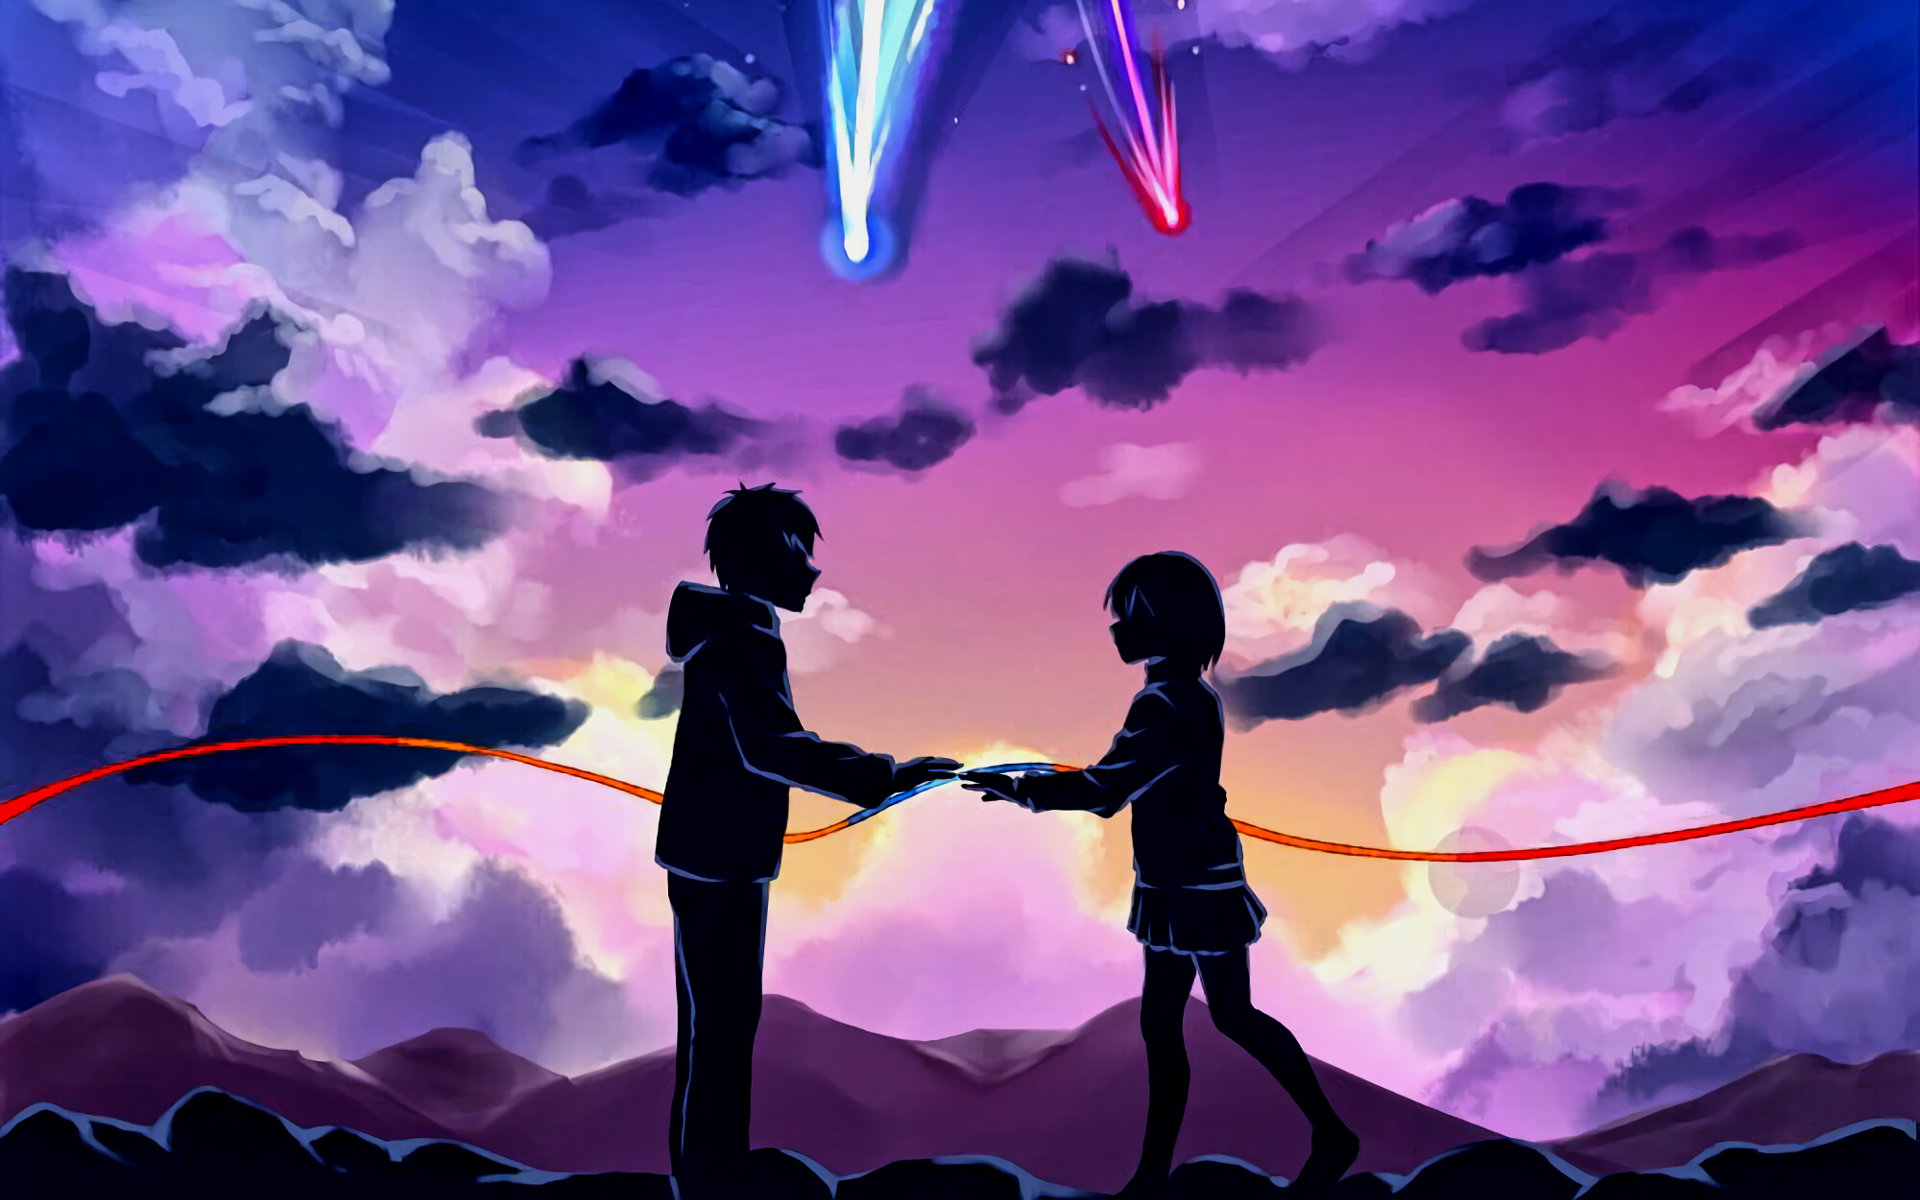 Makoto Shinkai Kimi No Na Wa Your Name Wallpaper Full Hd Free Download Your Name Anime Kimi No Na Wa Wallpaper Kimi No Na Wa